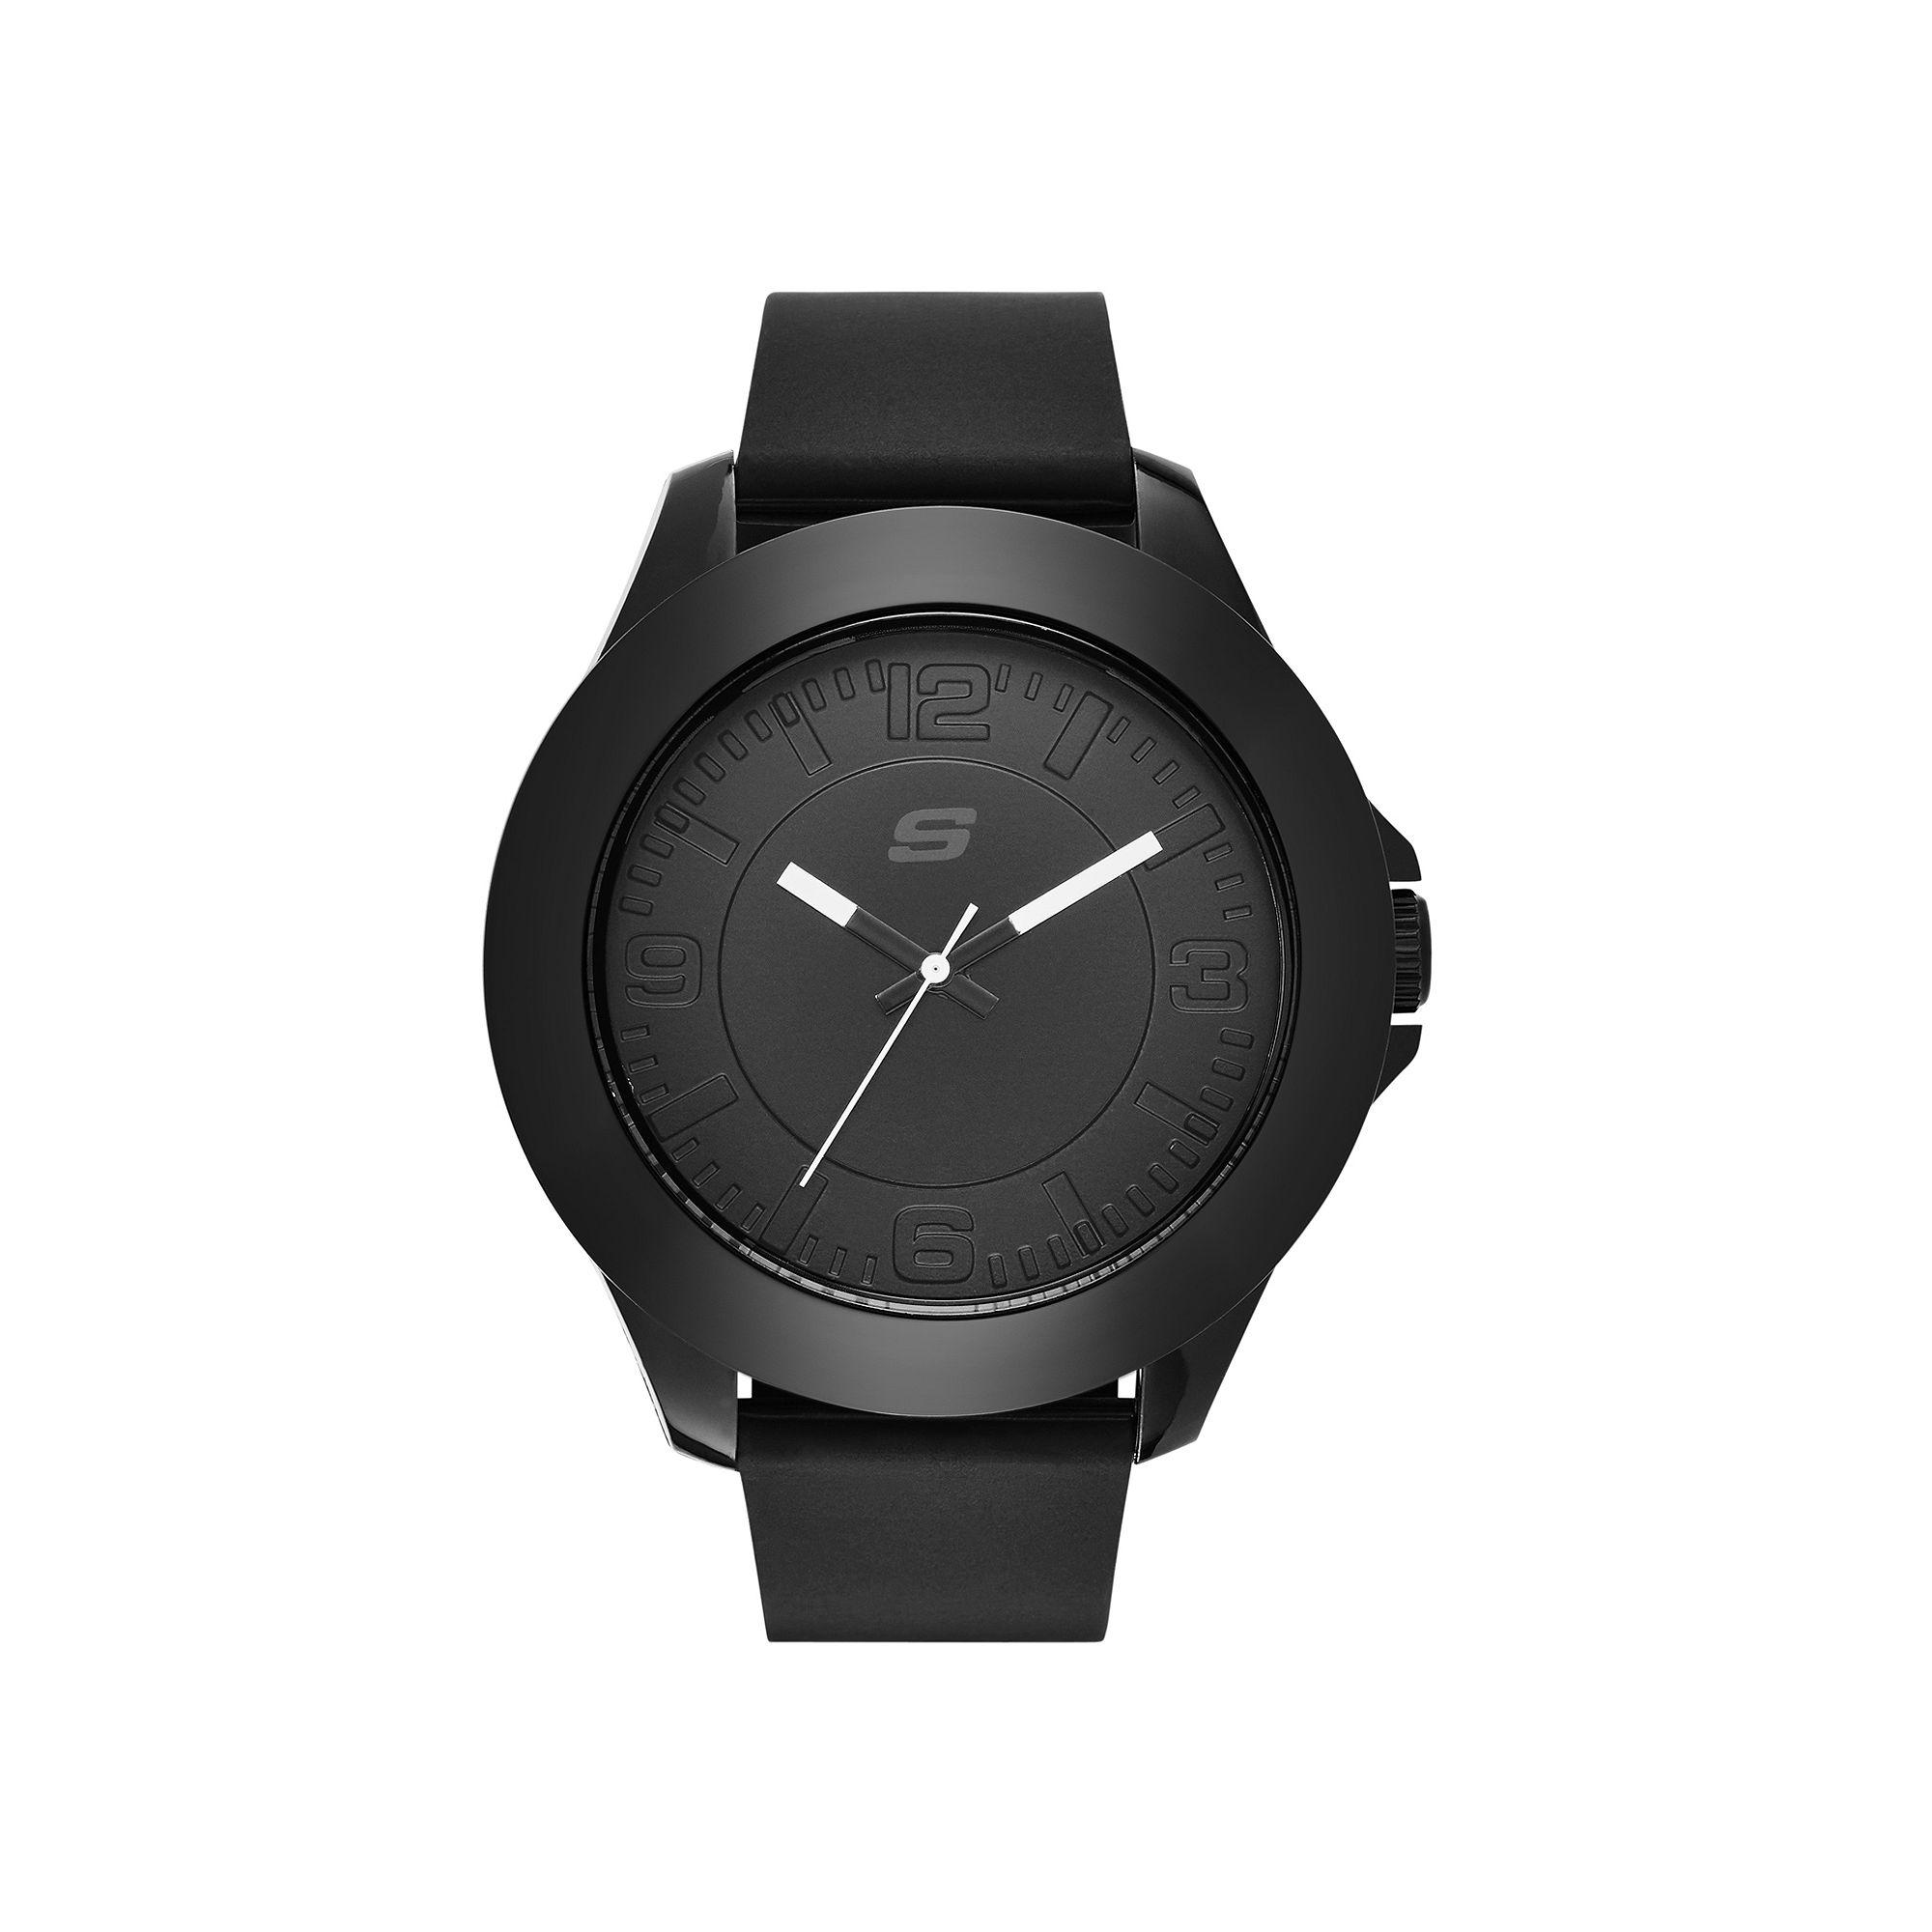 Skechers Men's Black Silicone Strap Analog Watch